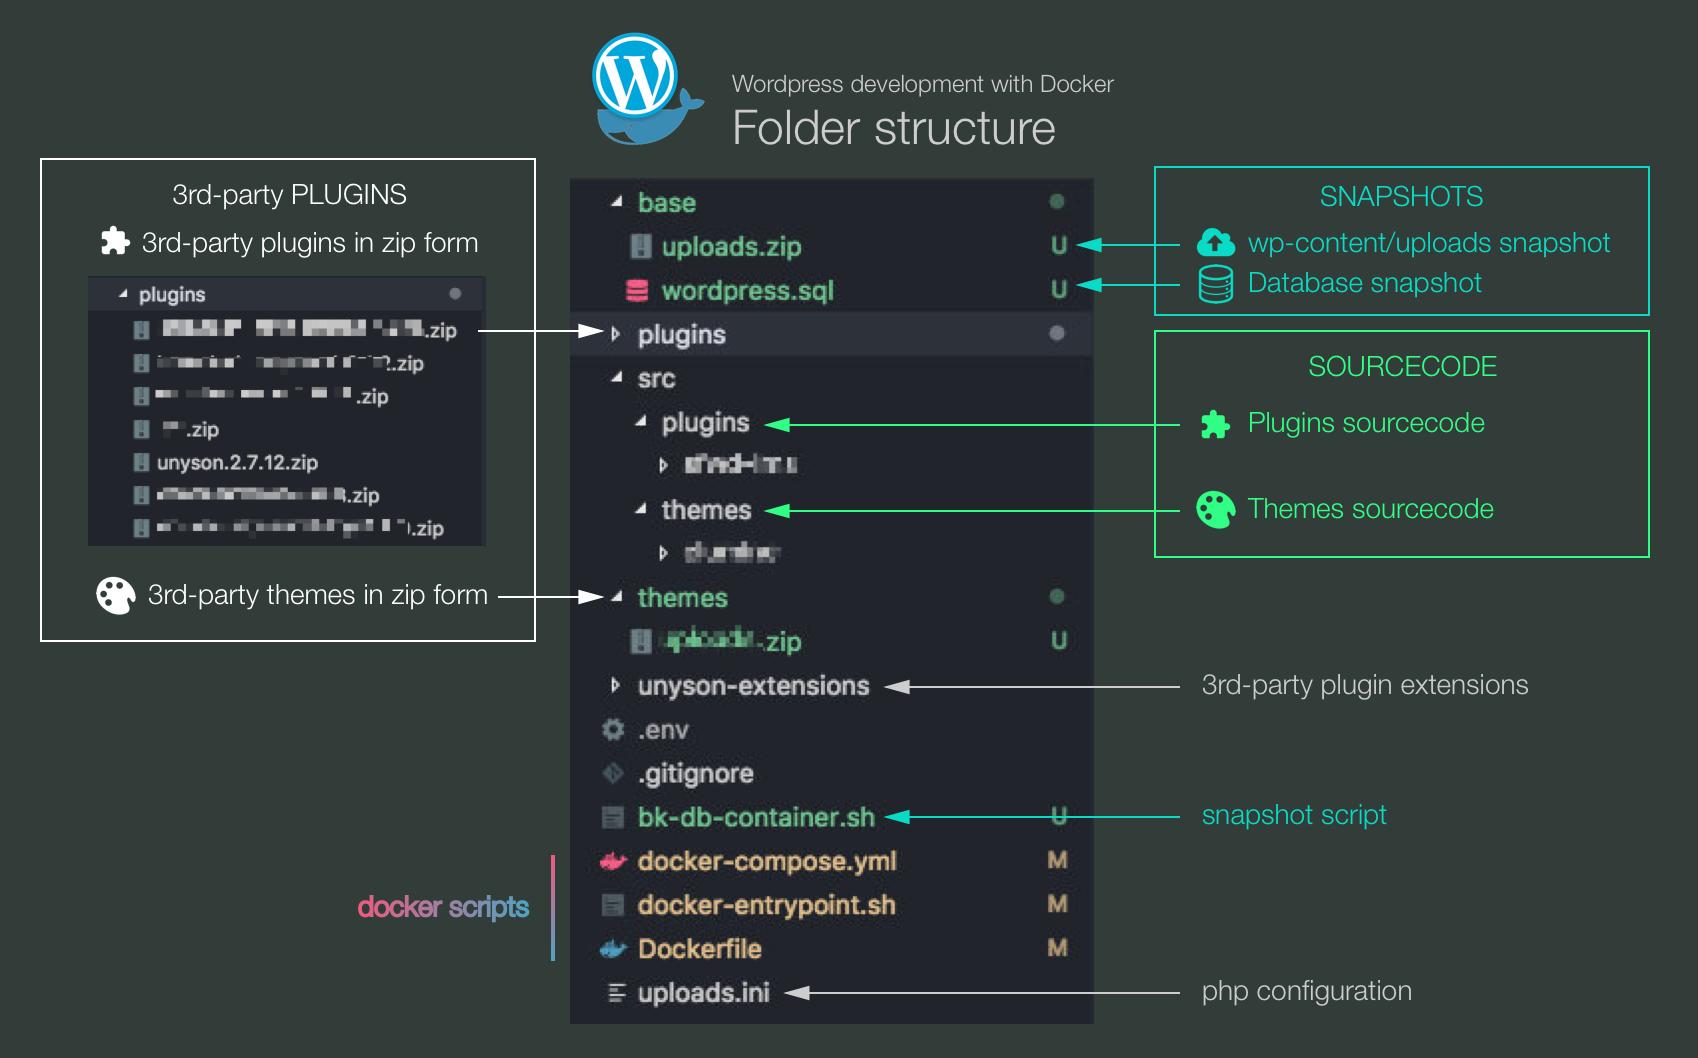 Wordpress development with Docker